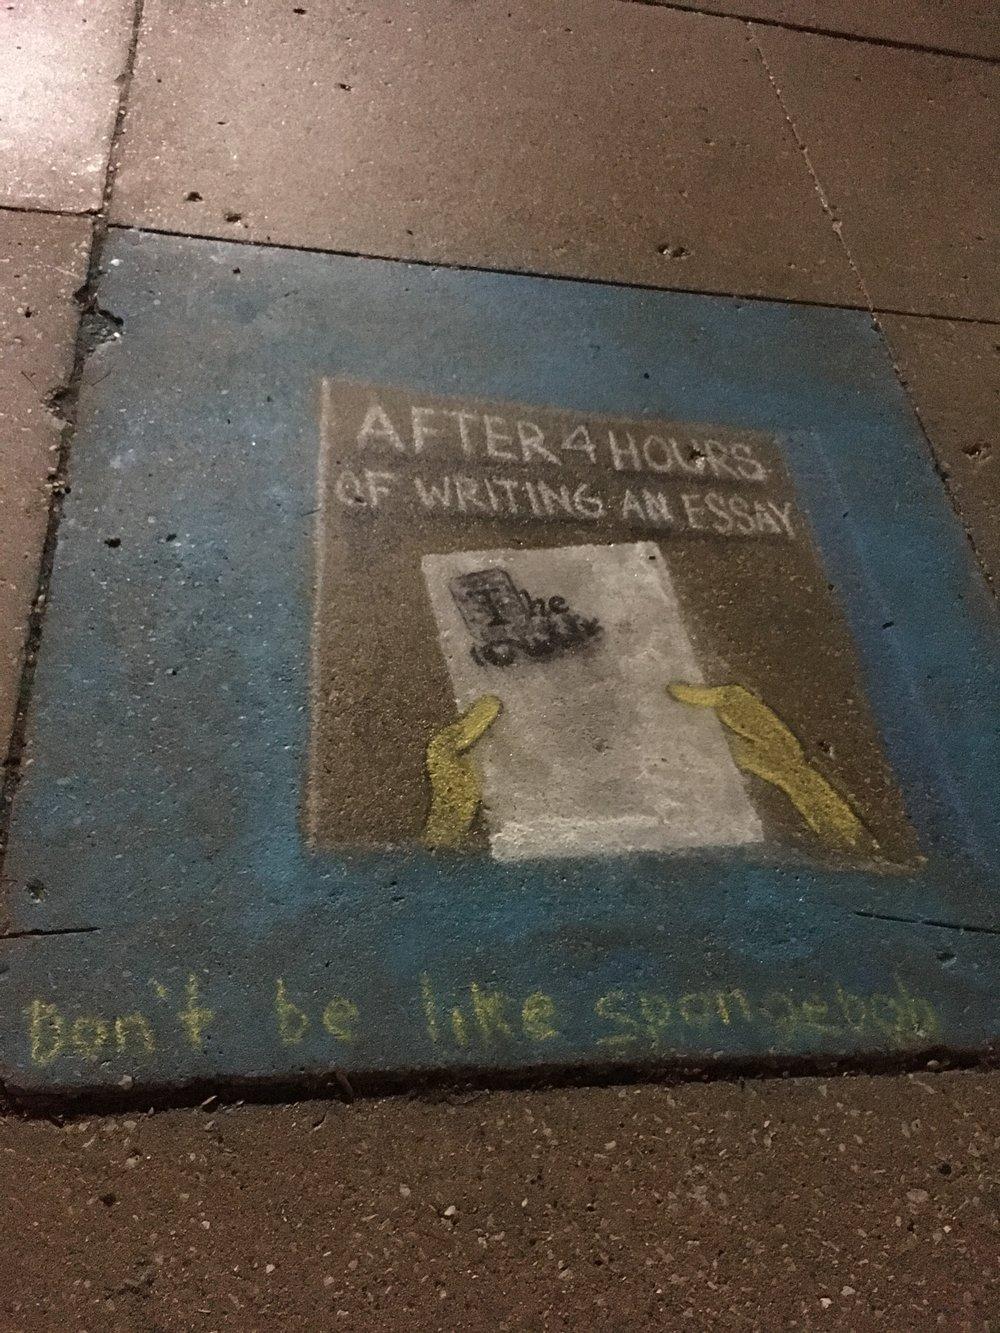 Spongebob's advice for the kiddies at Morton College